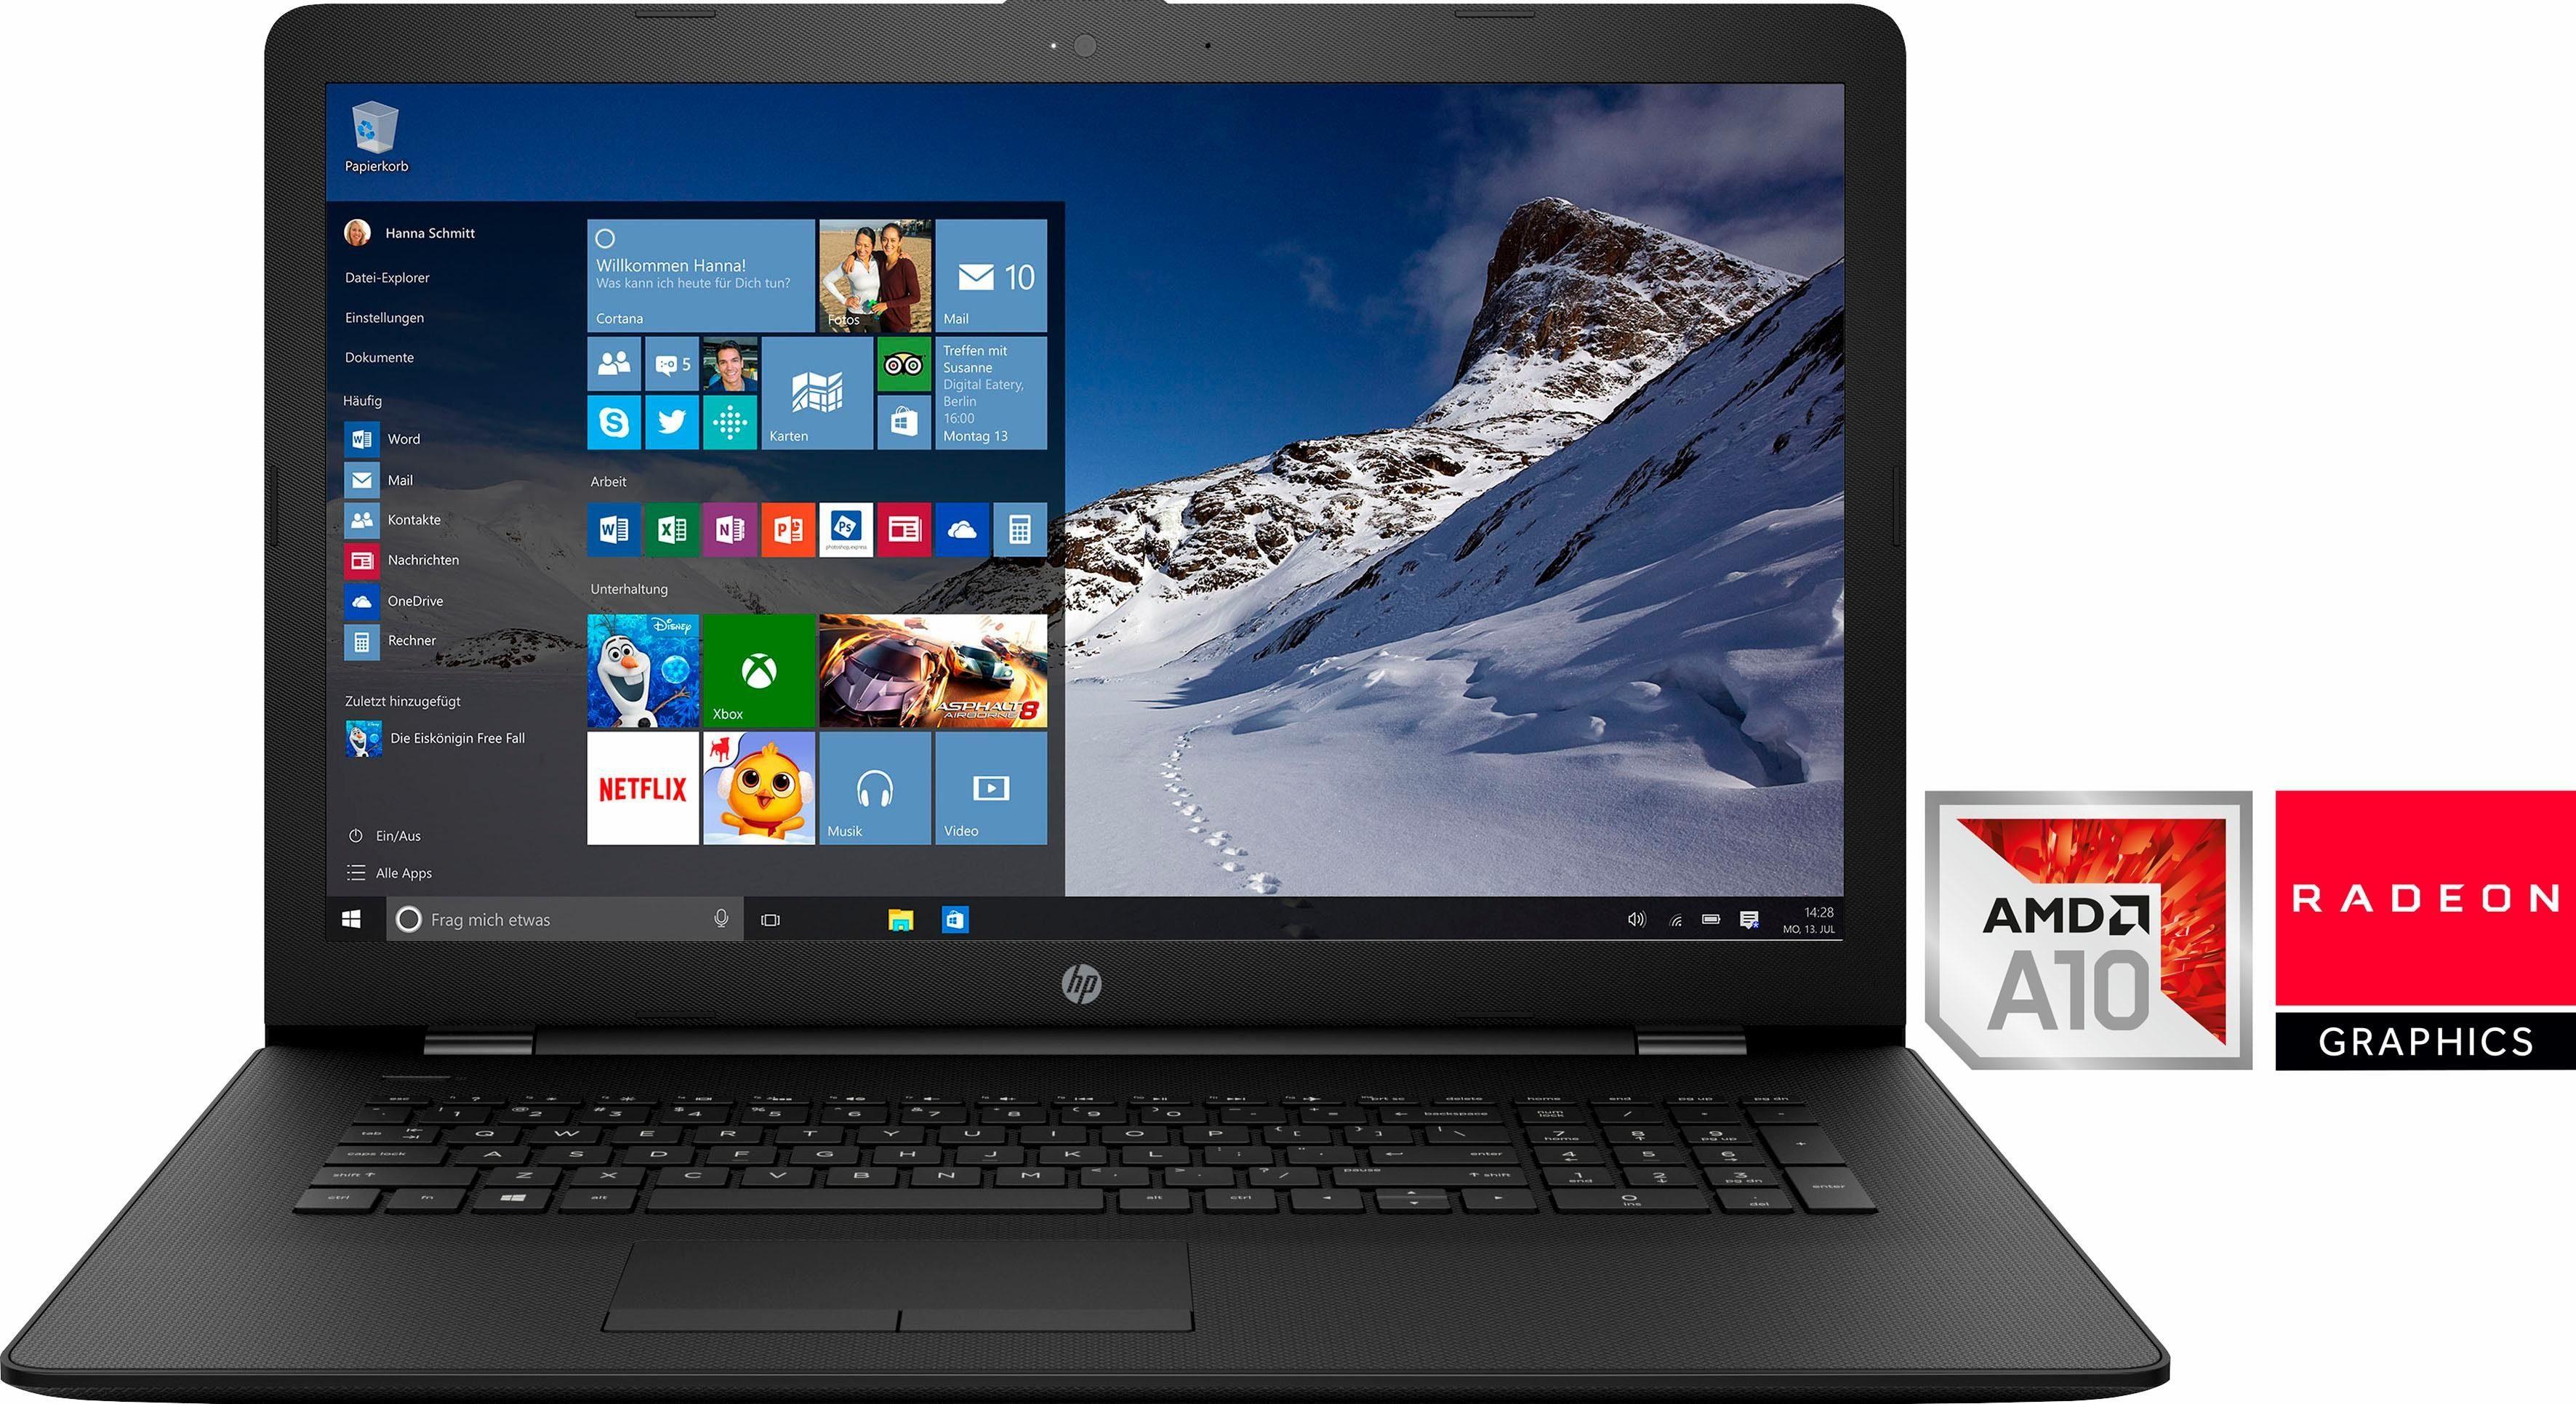 HP HP 17-ak061ng Notebook, AMD Quad Core A10, 43,9 cm (17,3 Zoll), 1000 GB Speicher